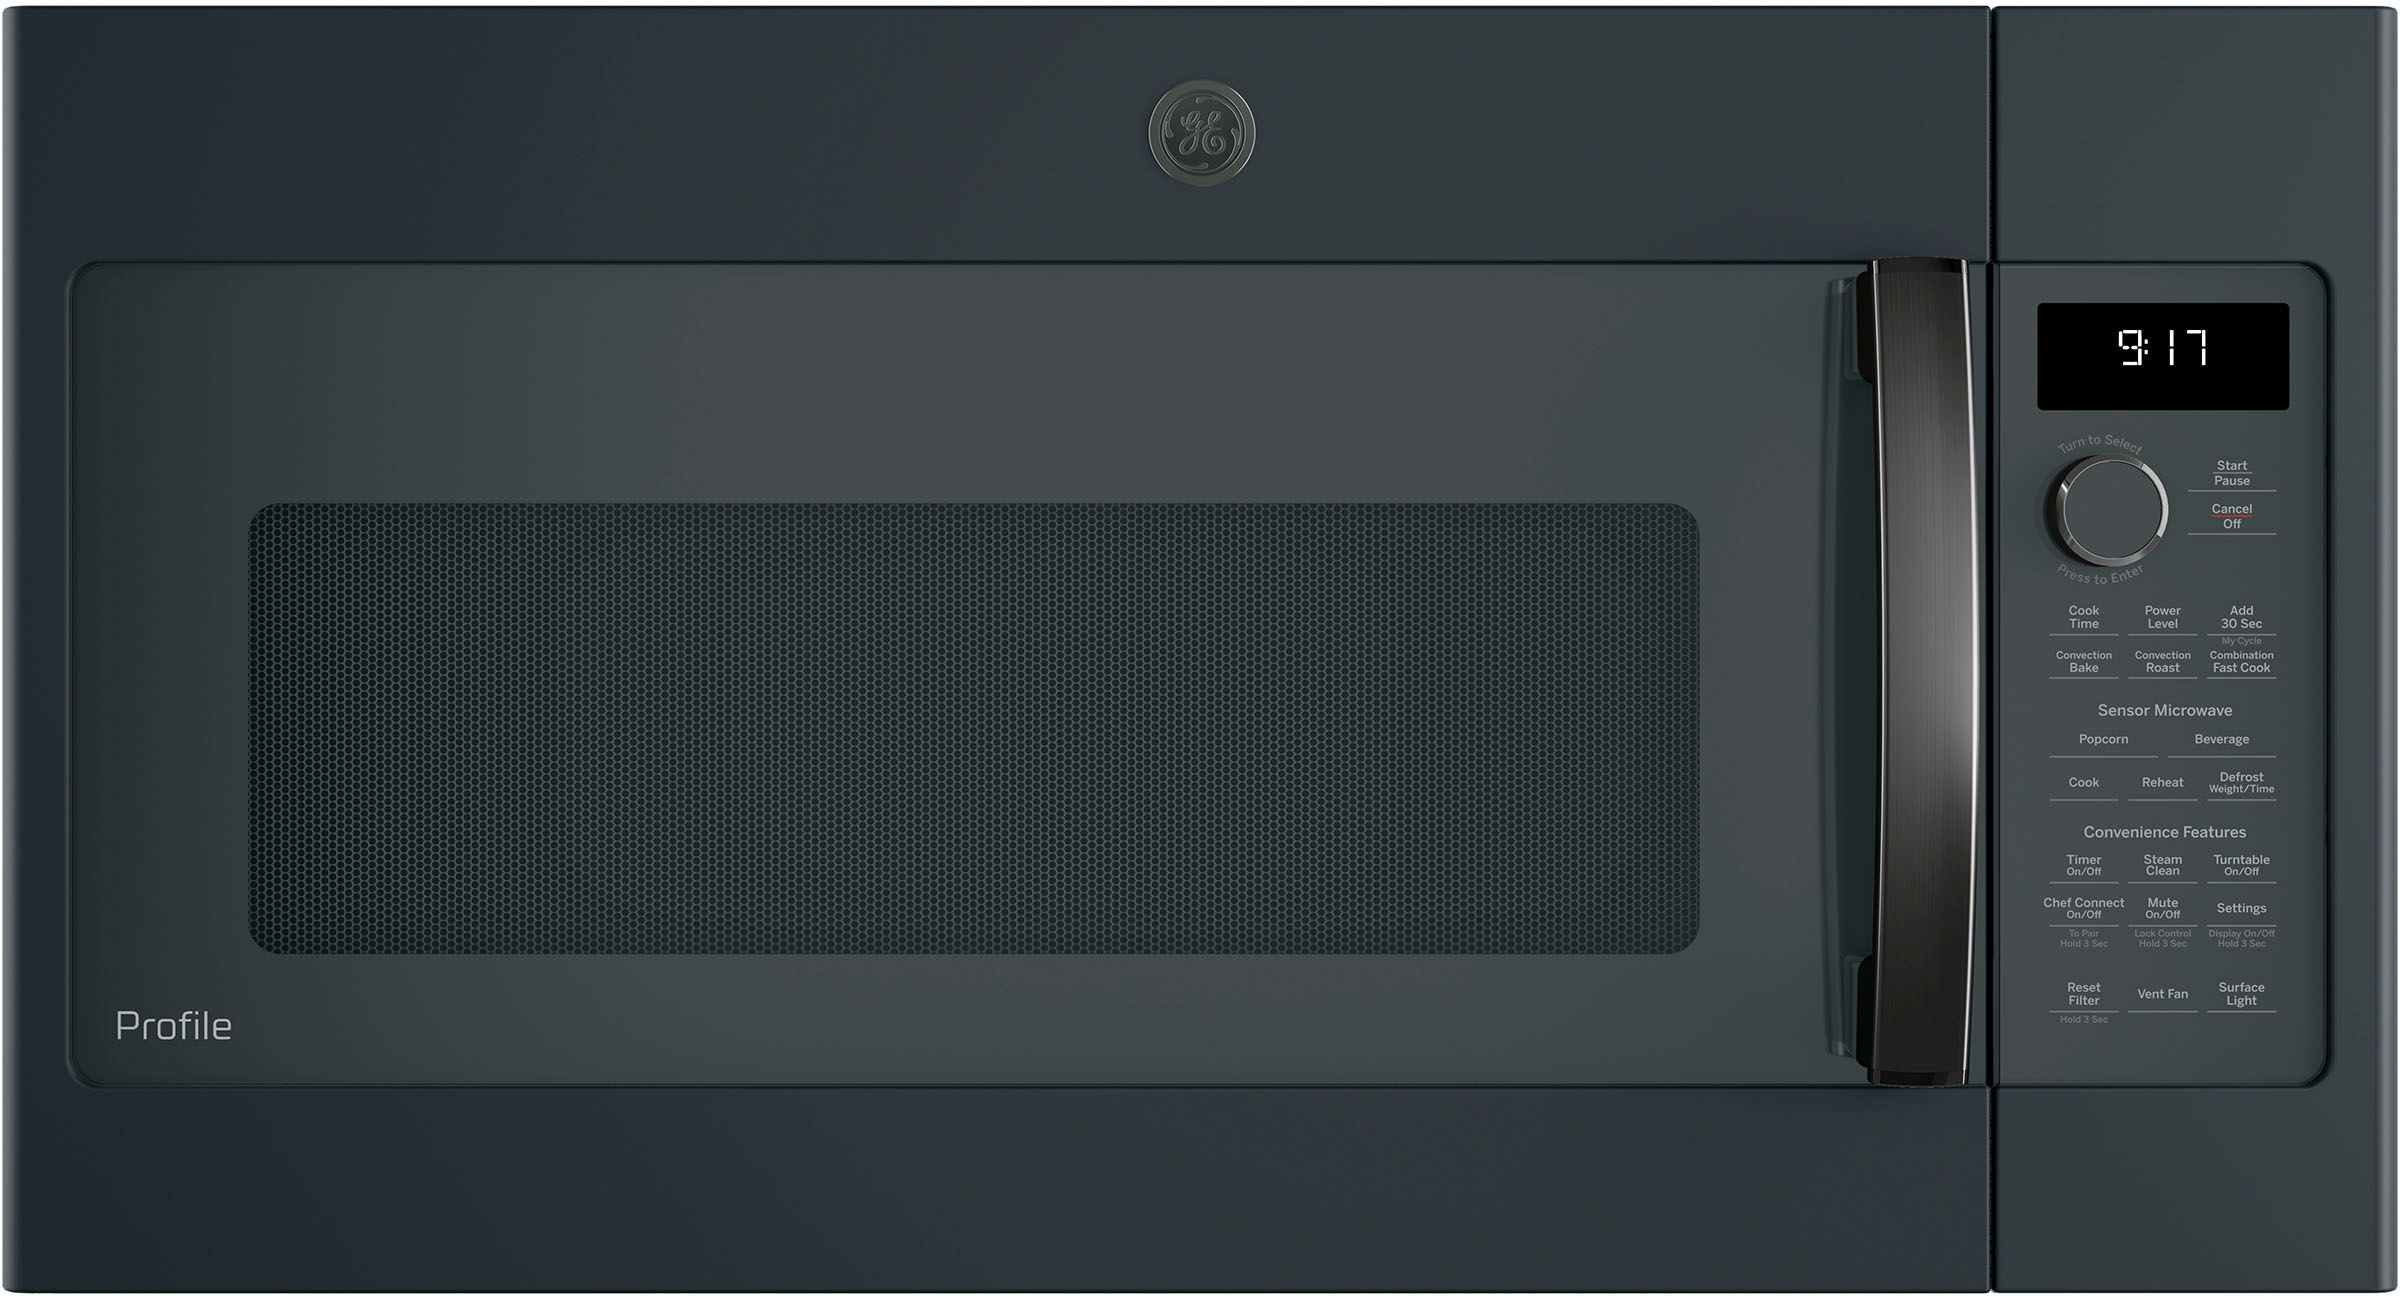 Ge Profile Over The Range Microwave Black Slate Pvm9179flds